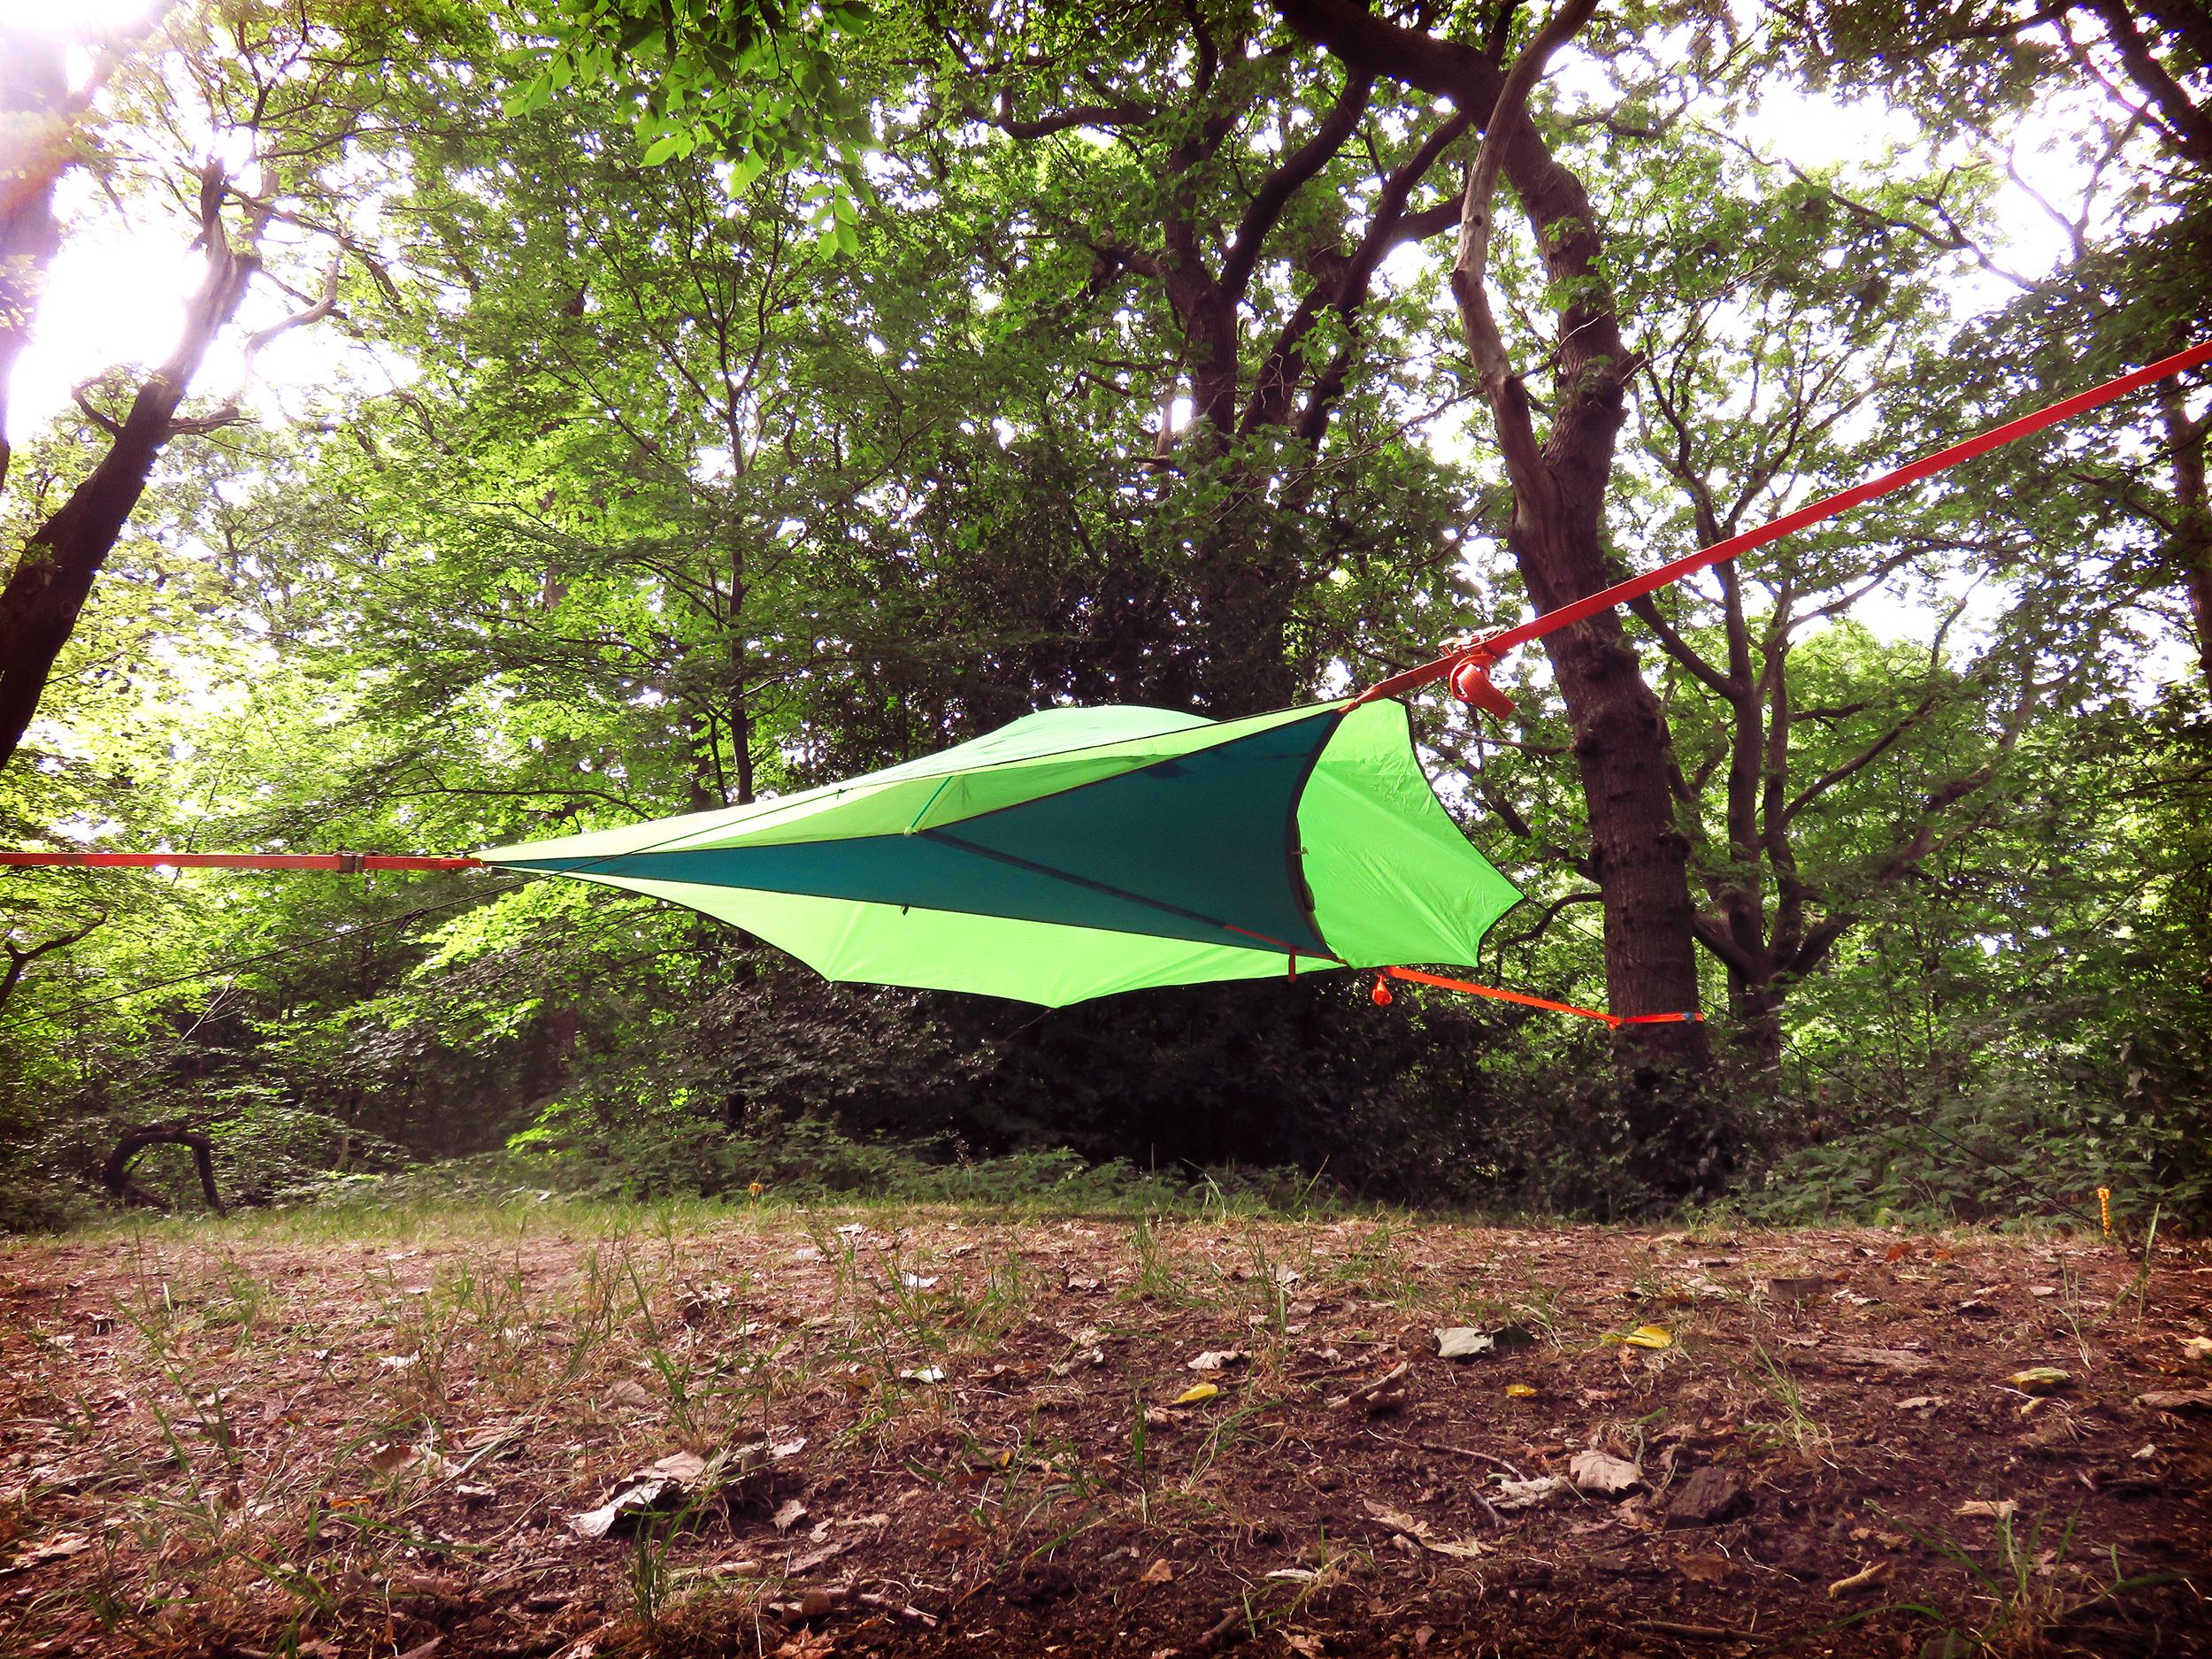 & Tentsile Flite+ 2-Person Tree Tent